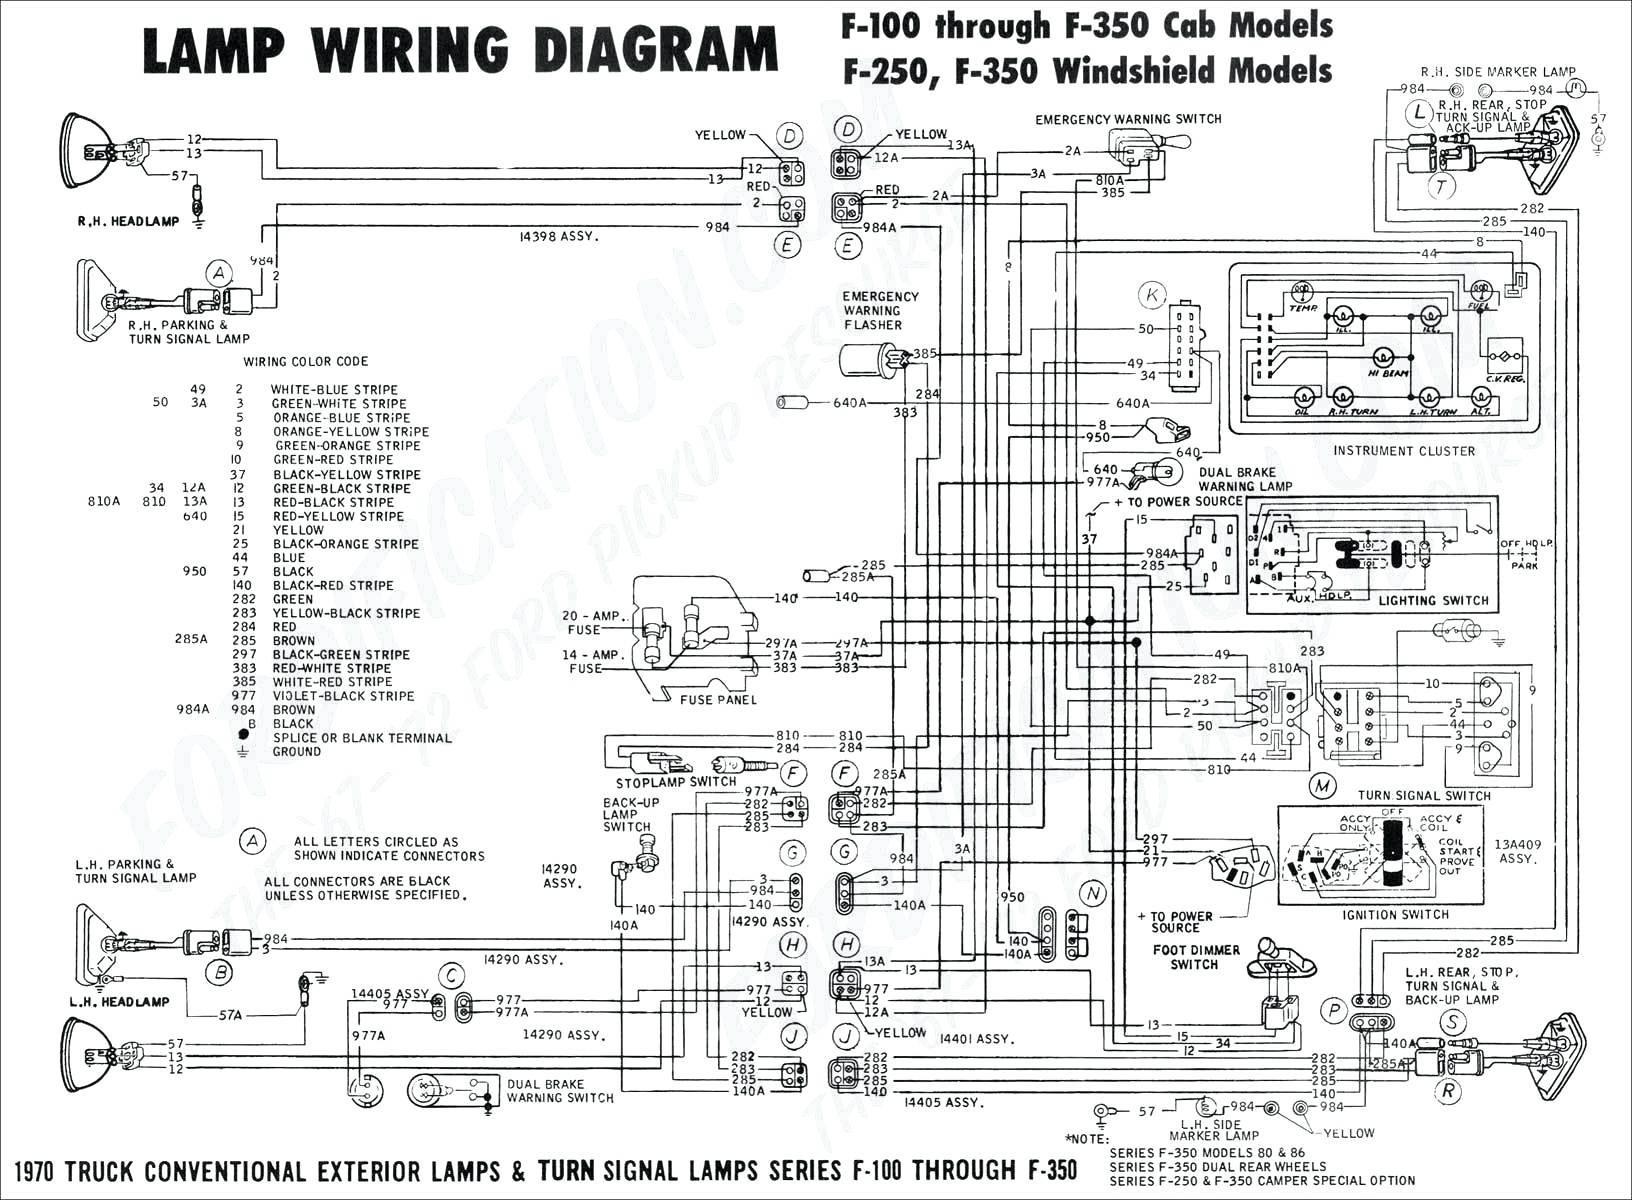 1999 Honda Accord Engine Diagram Honda C70 Wiring Diagram S Refrence 1999 Honda Accord Ignition Of 1999 Honda Accord Engine Diagram